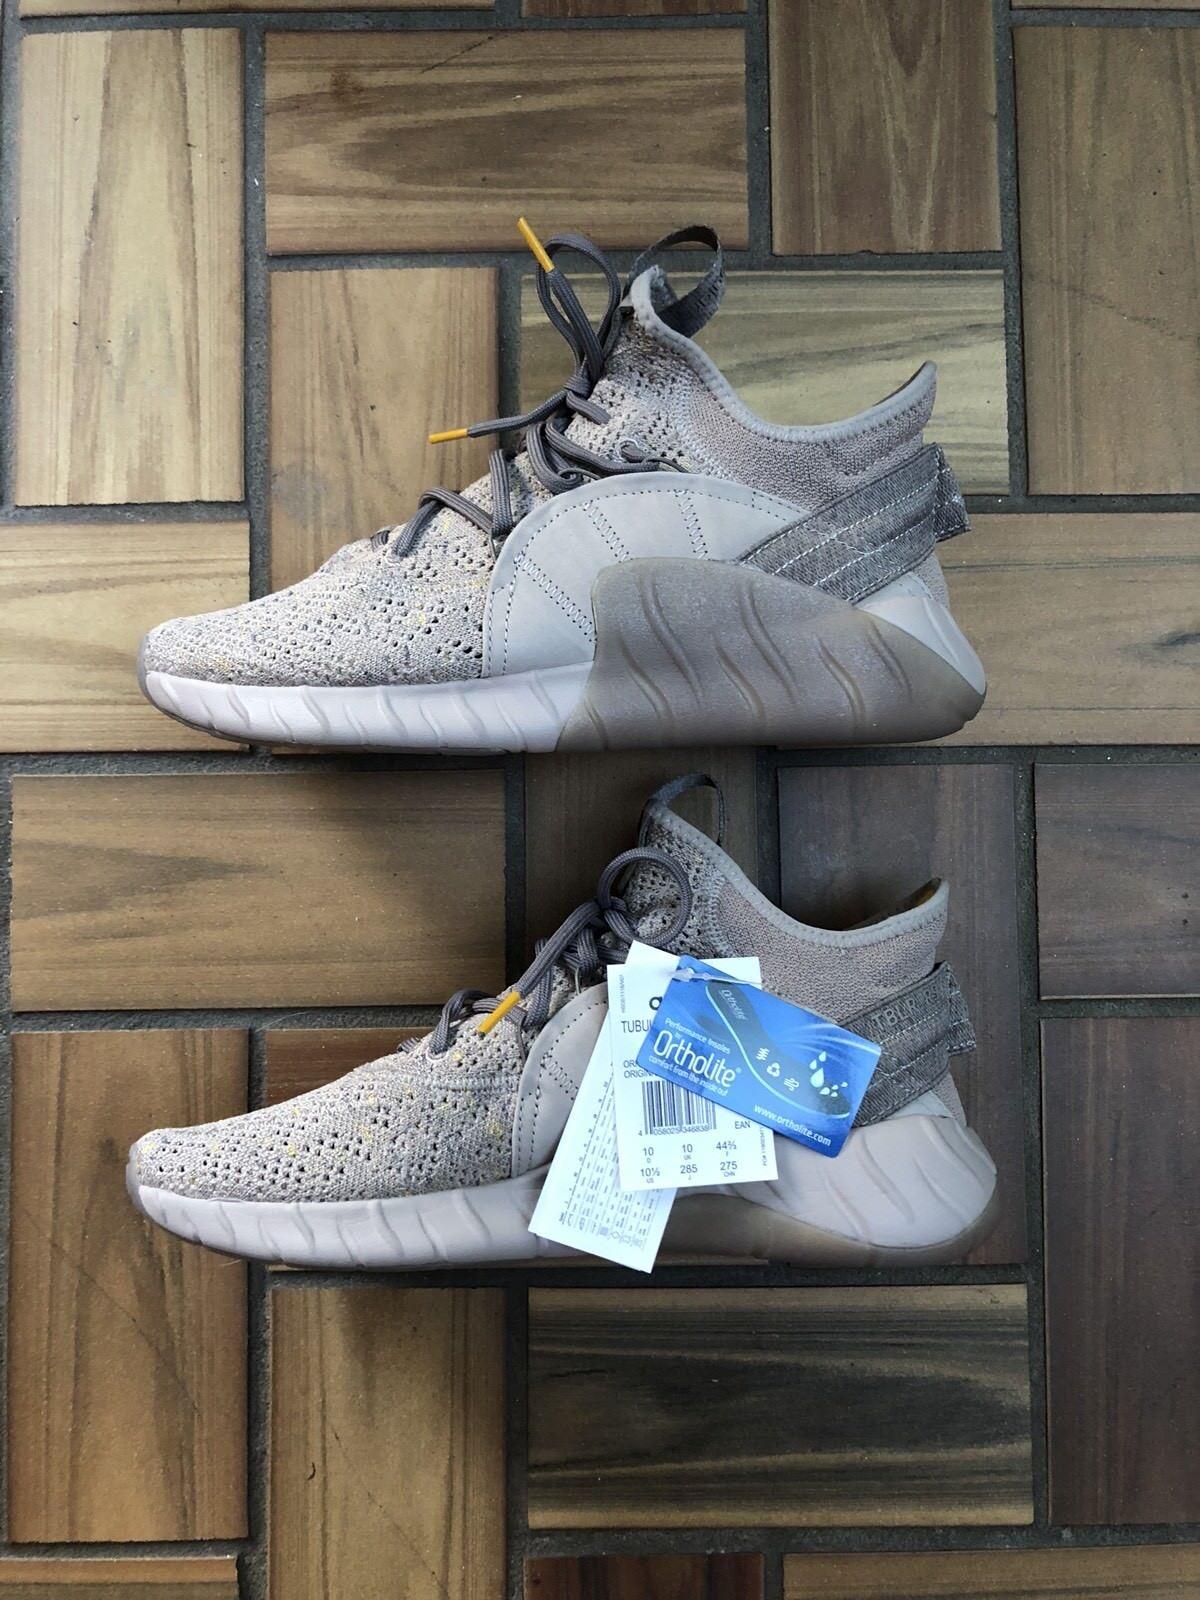 adidas originaux primeknit / beige augHommes tation tubulaire tan tan tan jaune / hommes est 10,5 58ade9